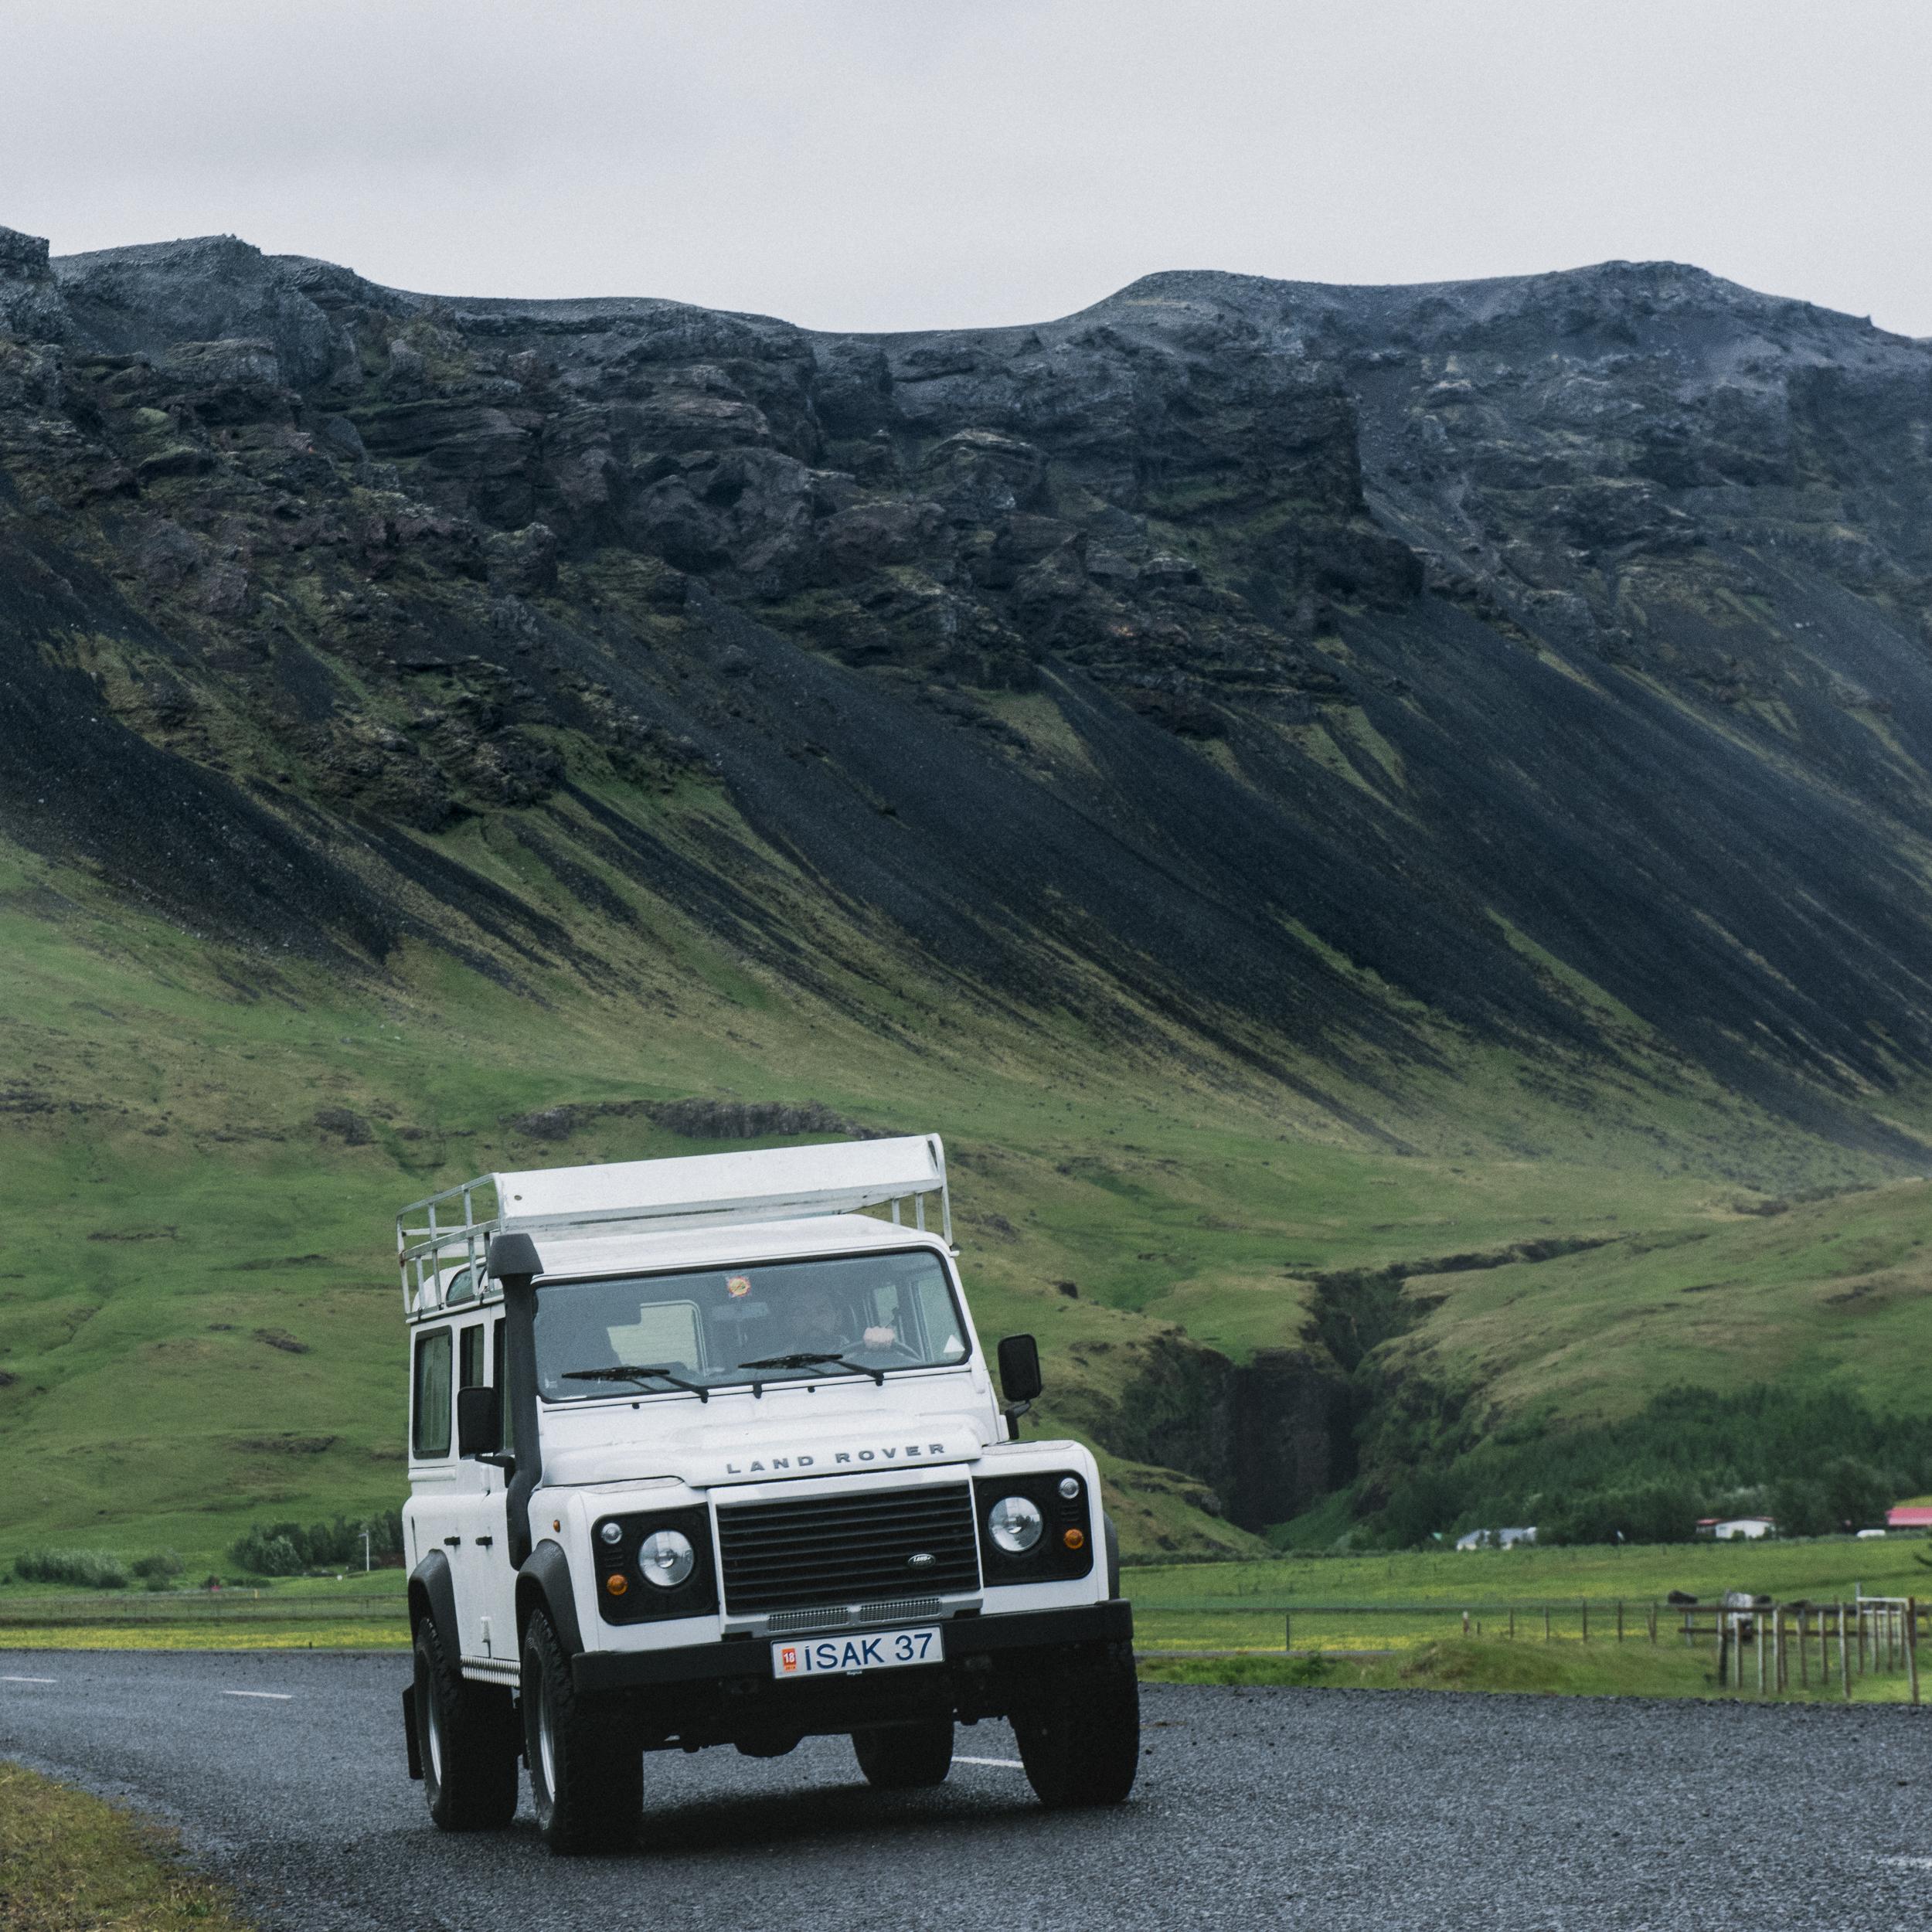 BexarGoods_Iceland_5035.jpg